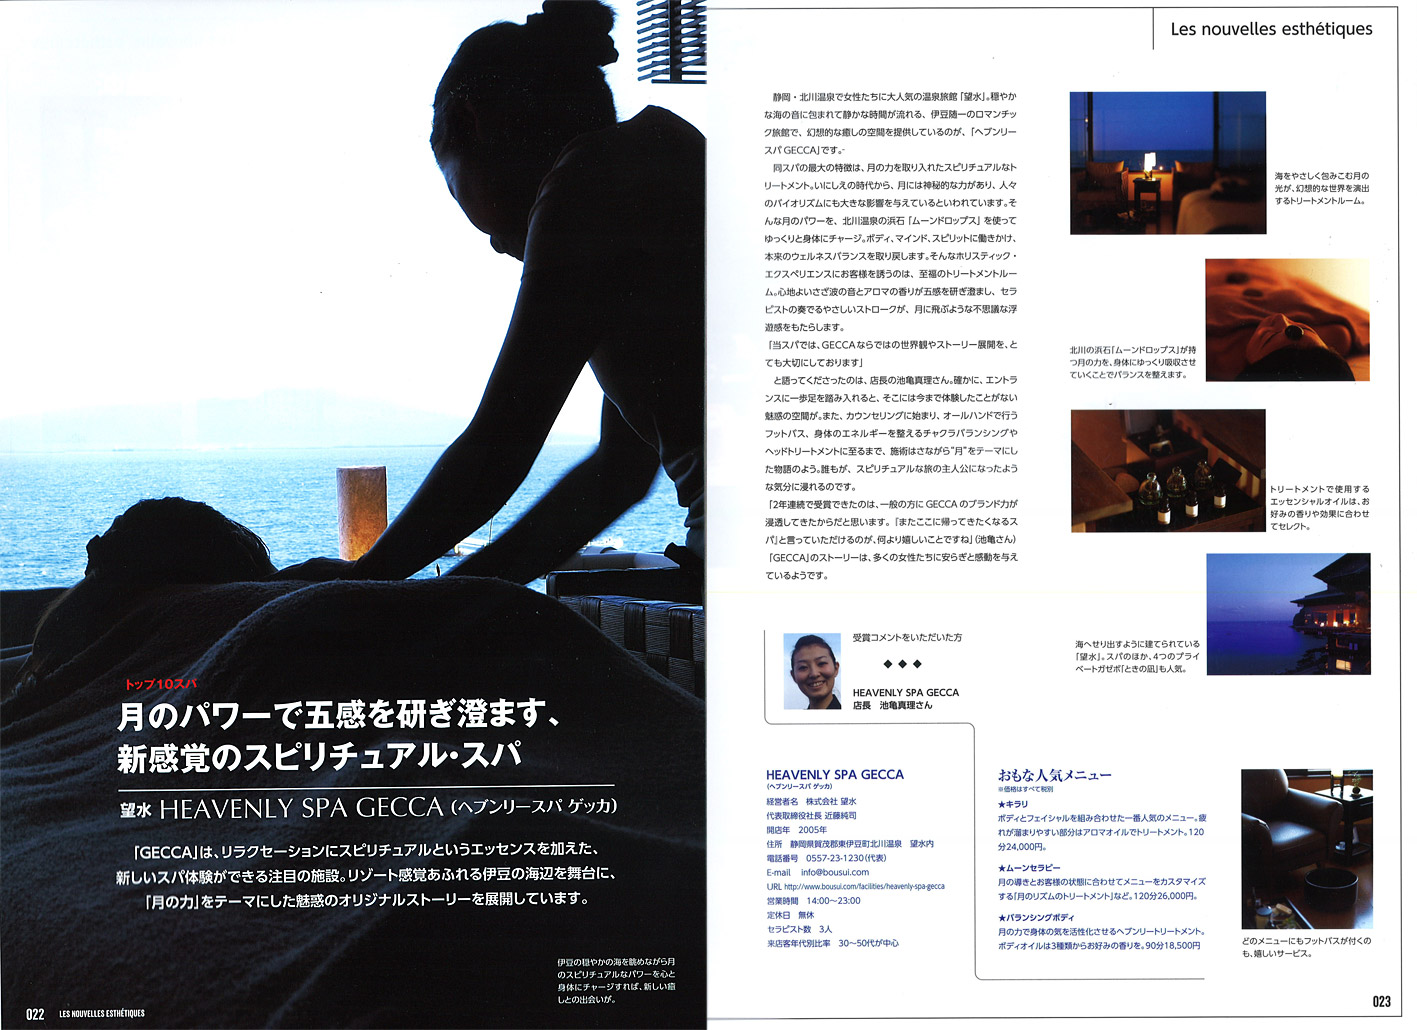 les nouvelles esthetiques Japan(ヌーヴェルエステティック日本版)